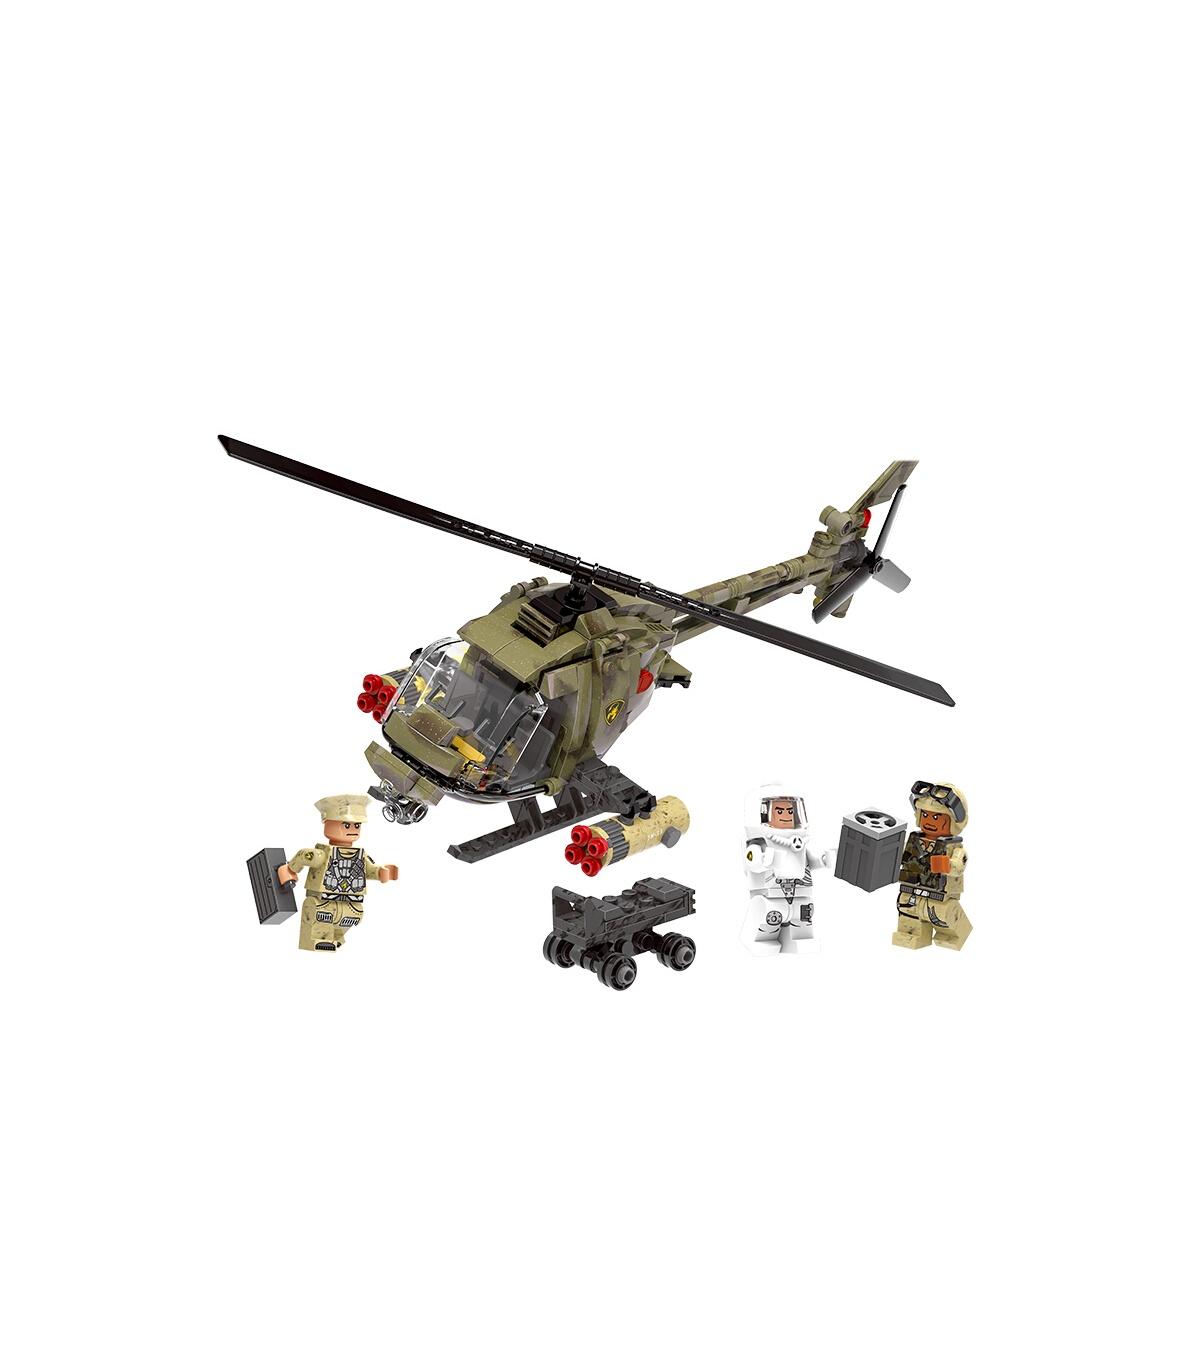 Xingbao Light Hawk Helicopter Building Bricks Set